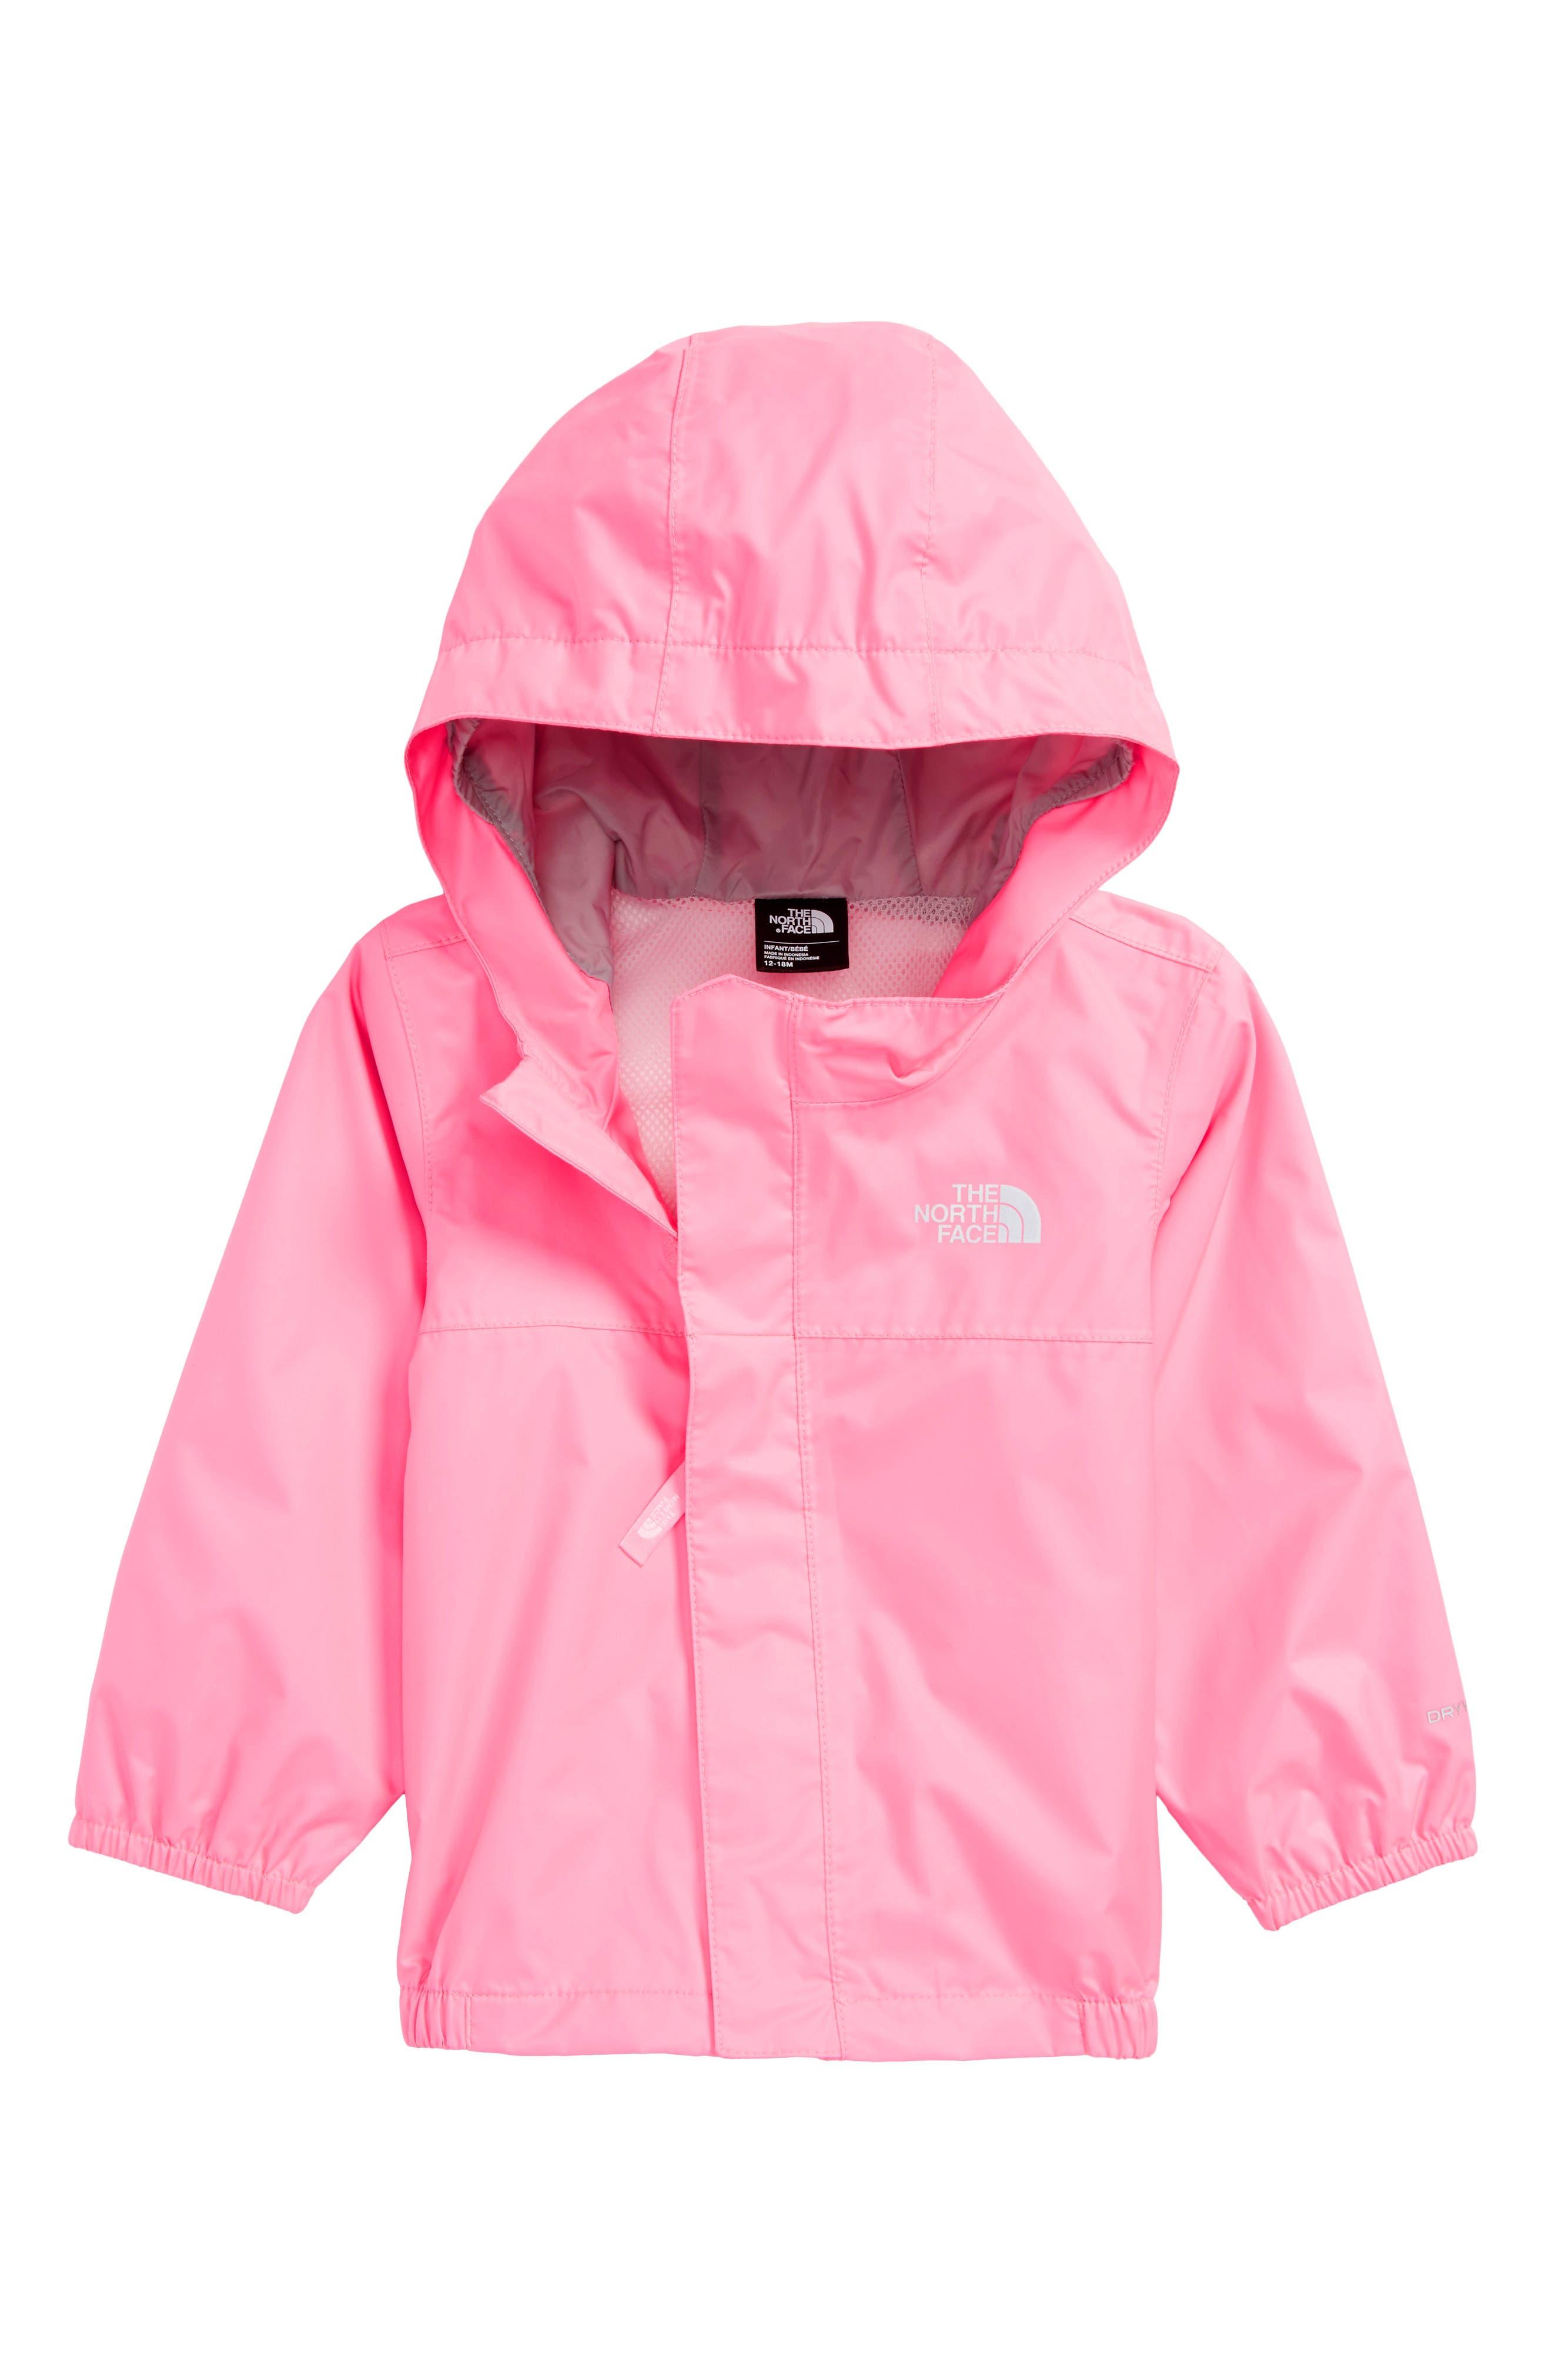 Tailout Hooded Rain Jacket,                             Main thumbnail 1, color,                             Gem Pink